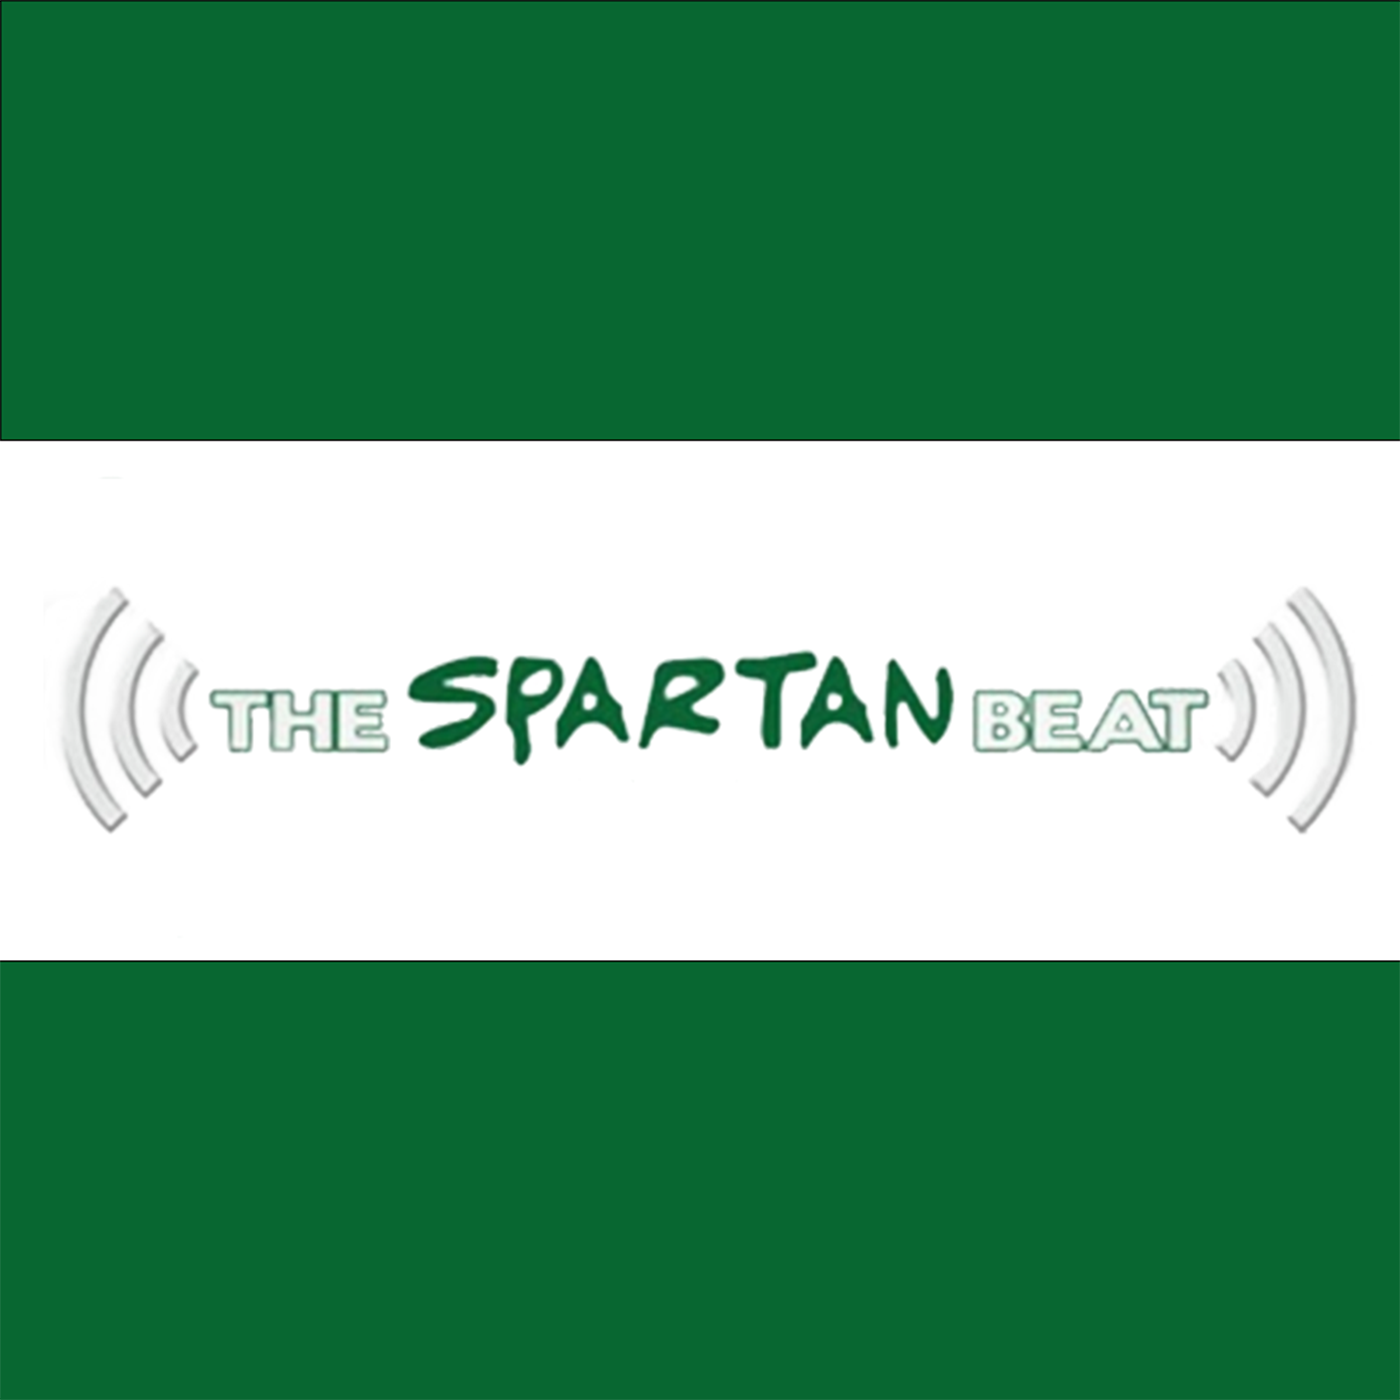 The Spartan Beat